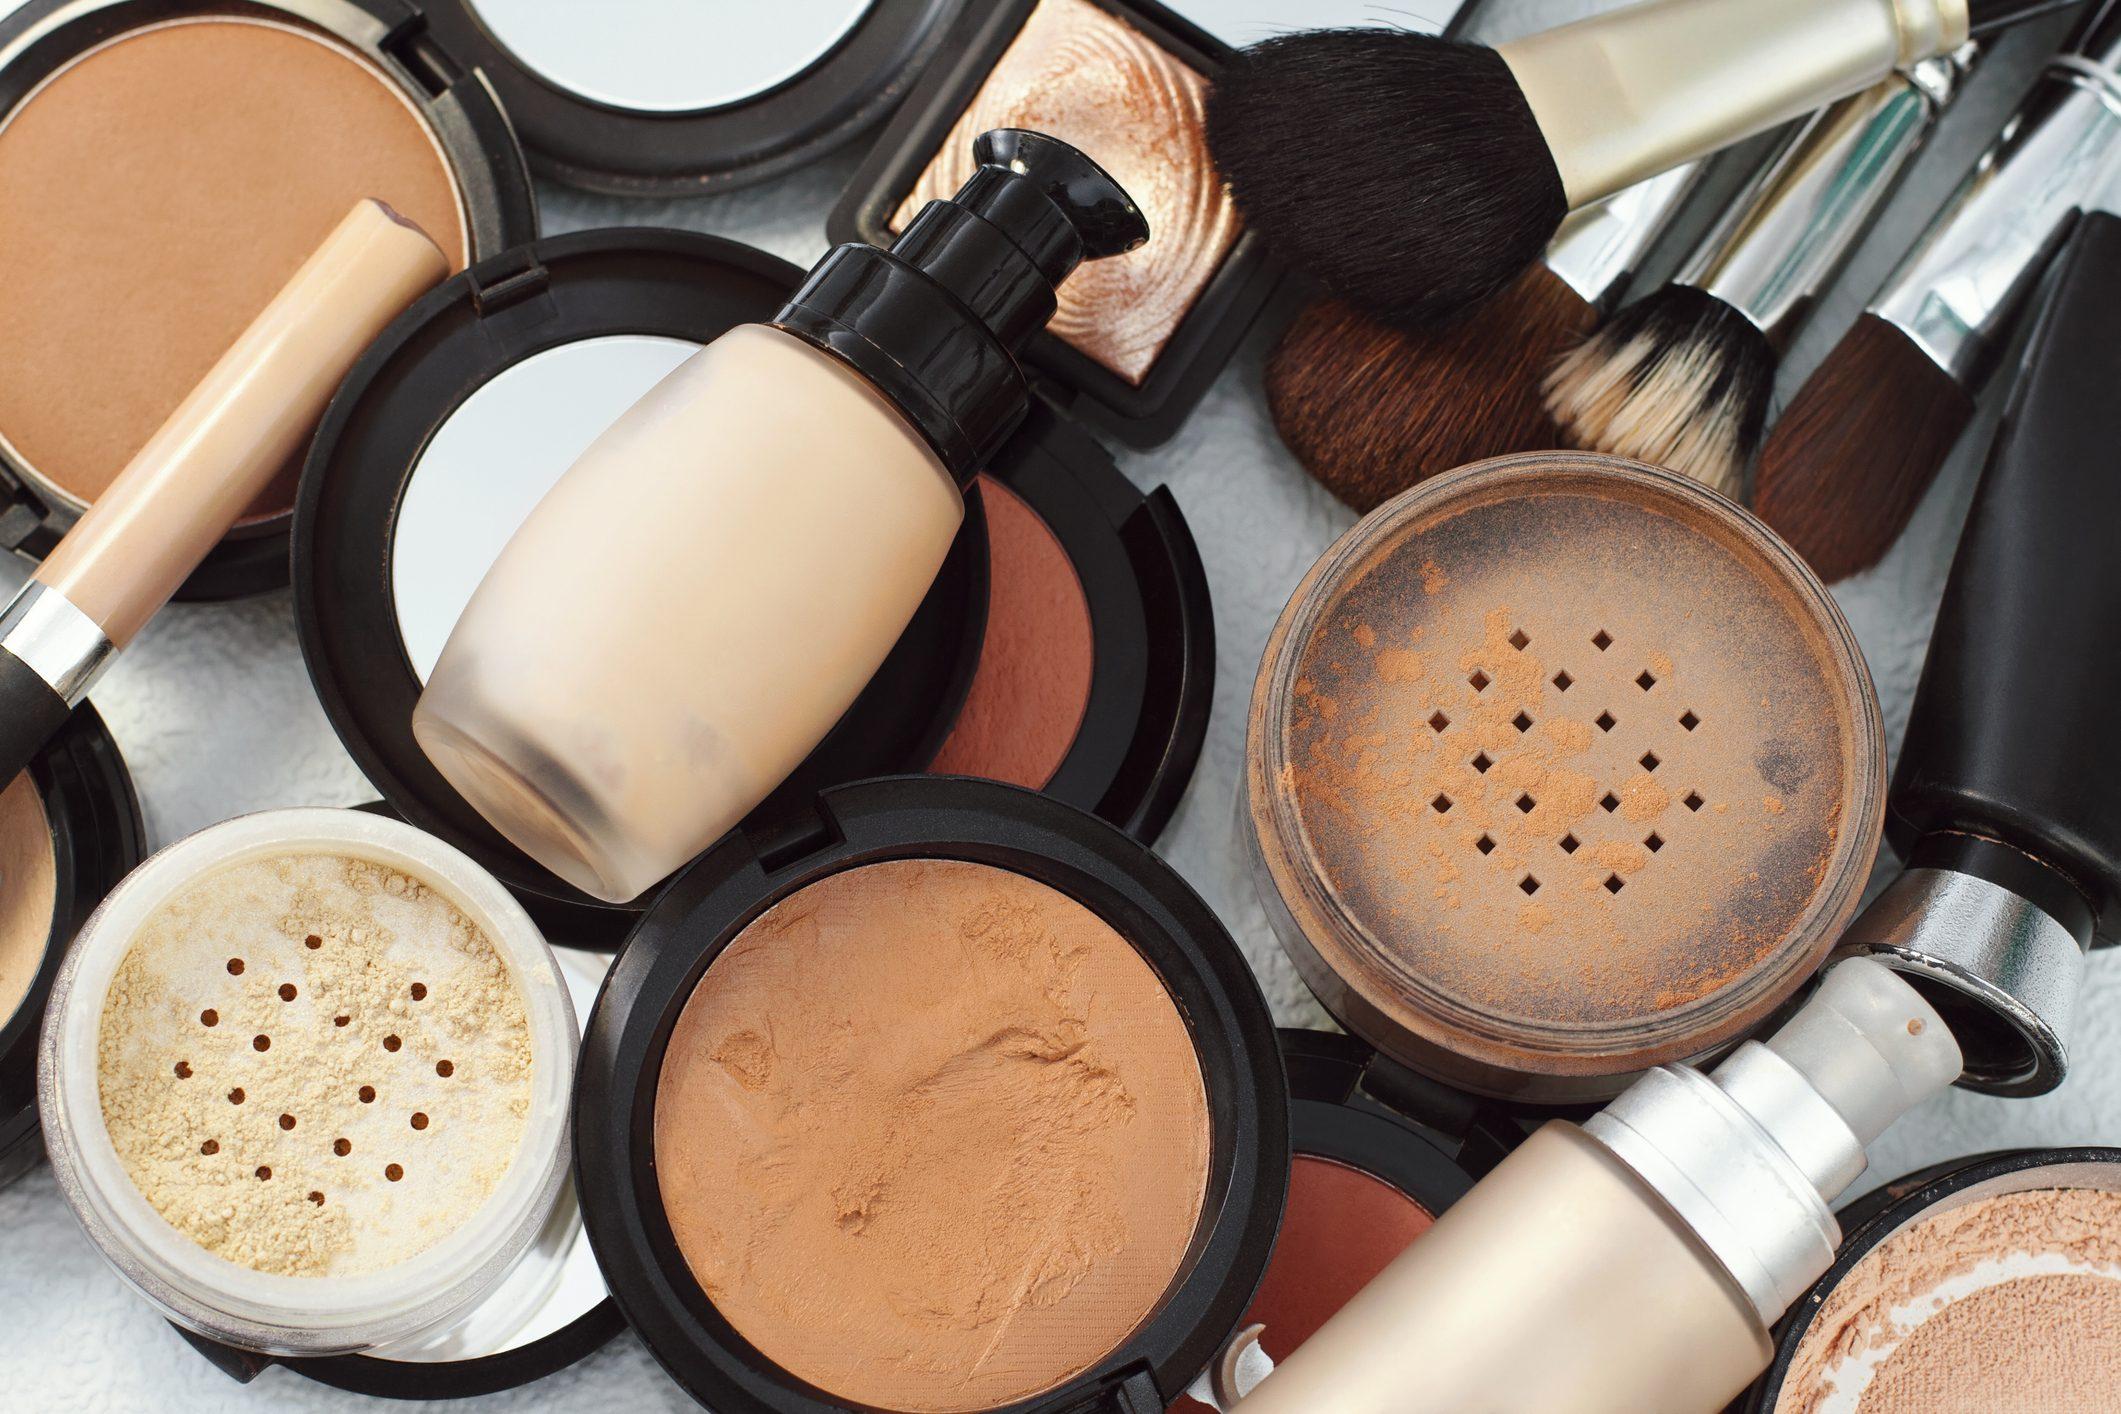 Set of decorative cosmetic, face powder, blush.